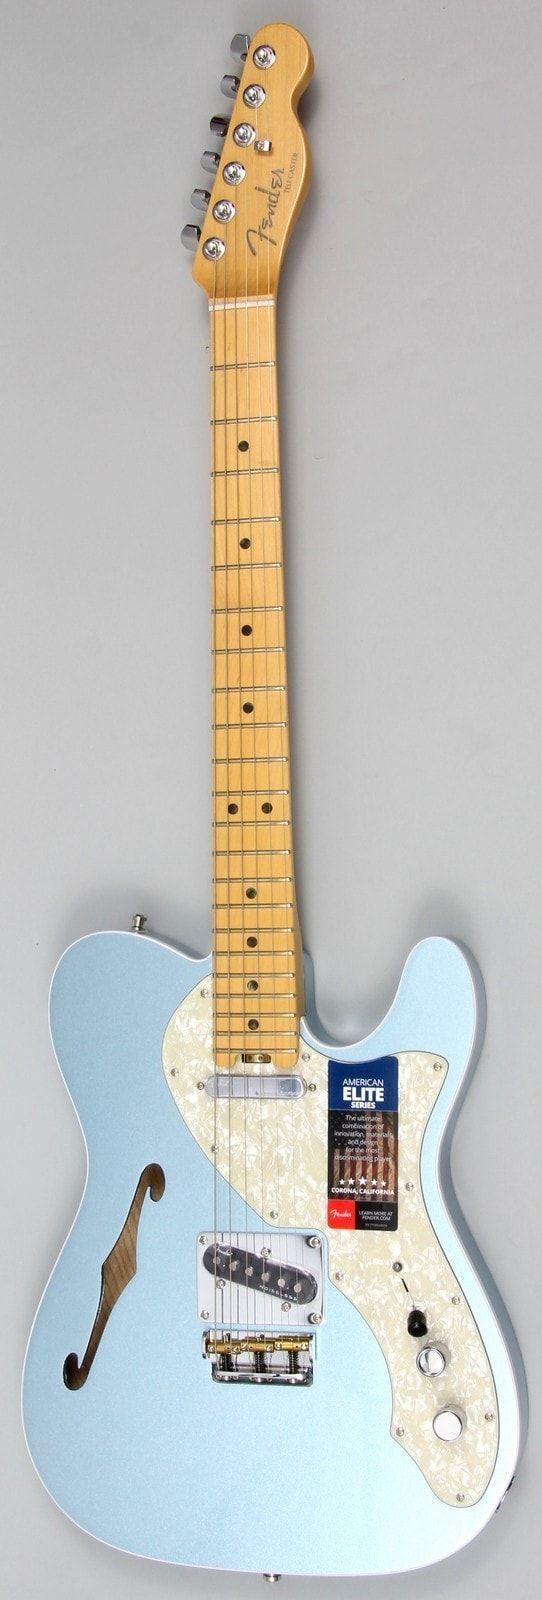 Fender American Elite Telecaster Thinline Electric Guitar #vintageguitars